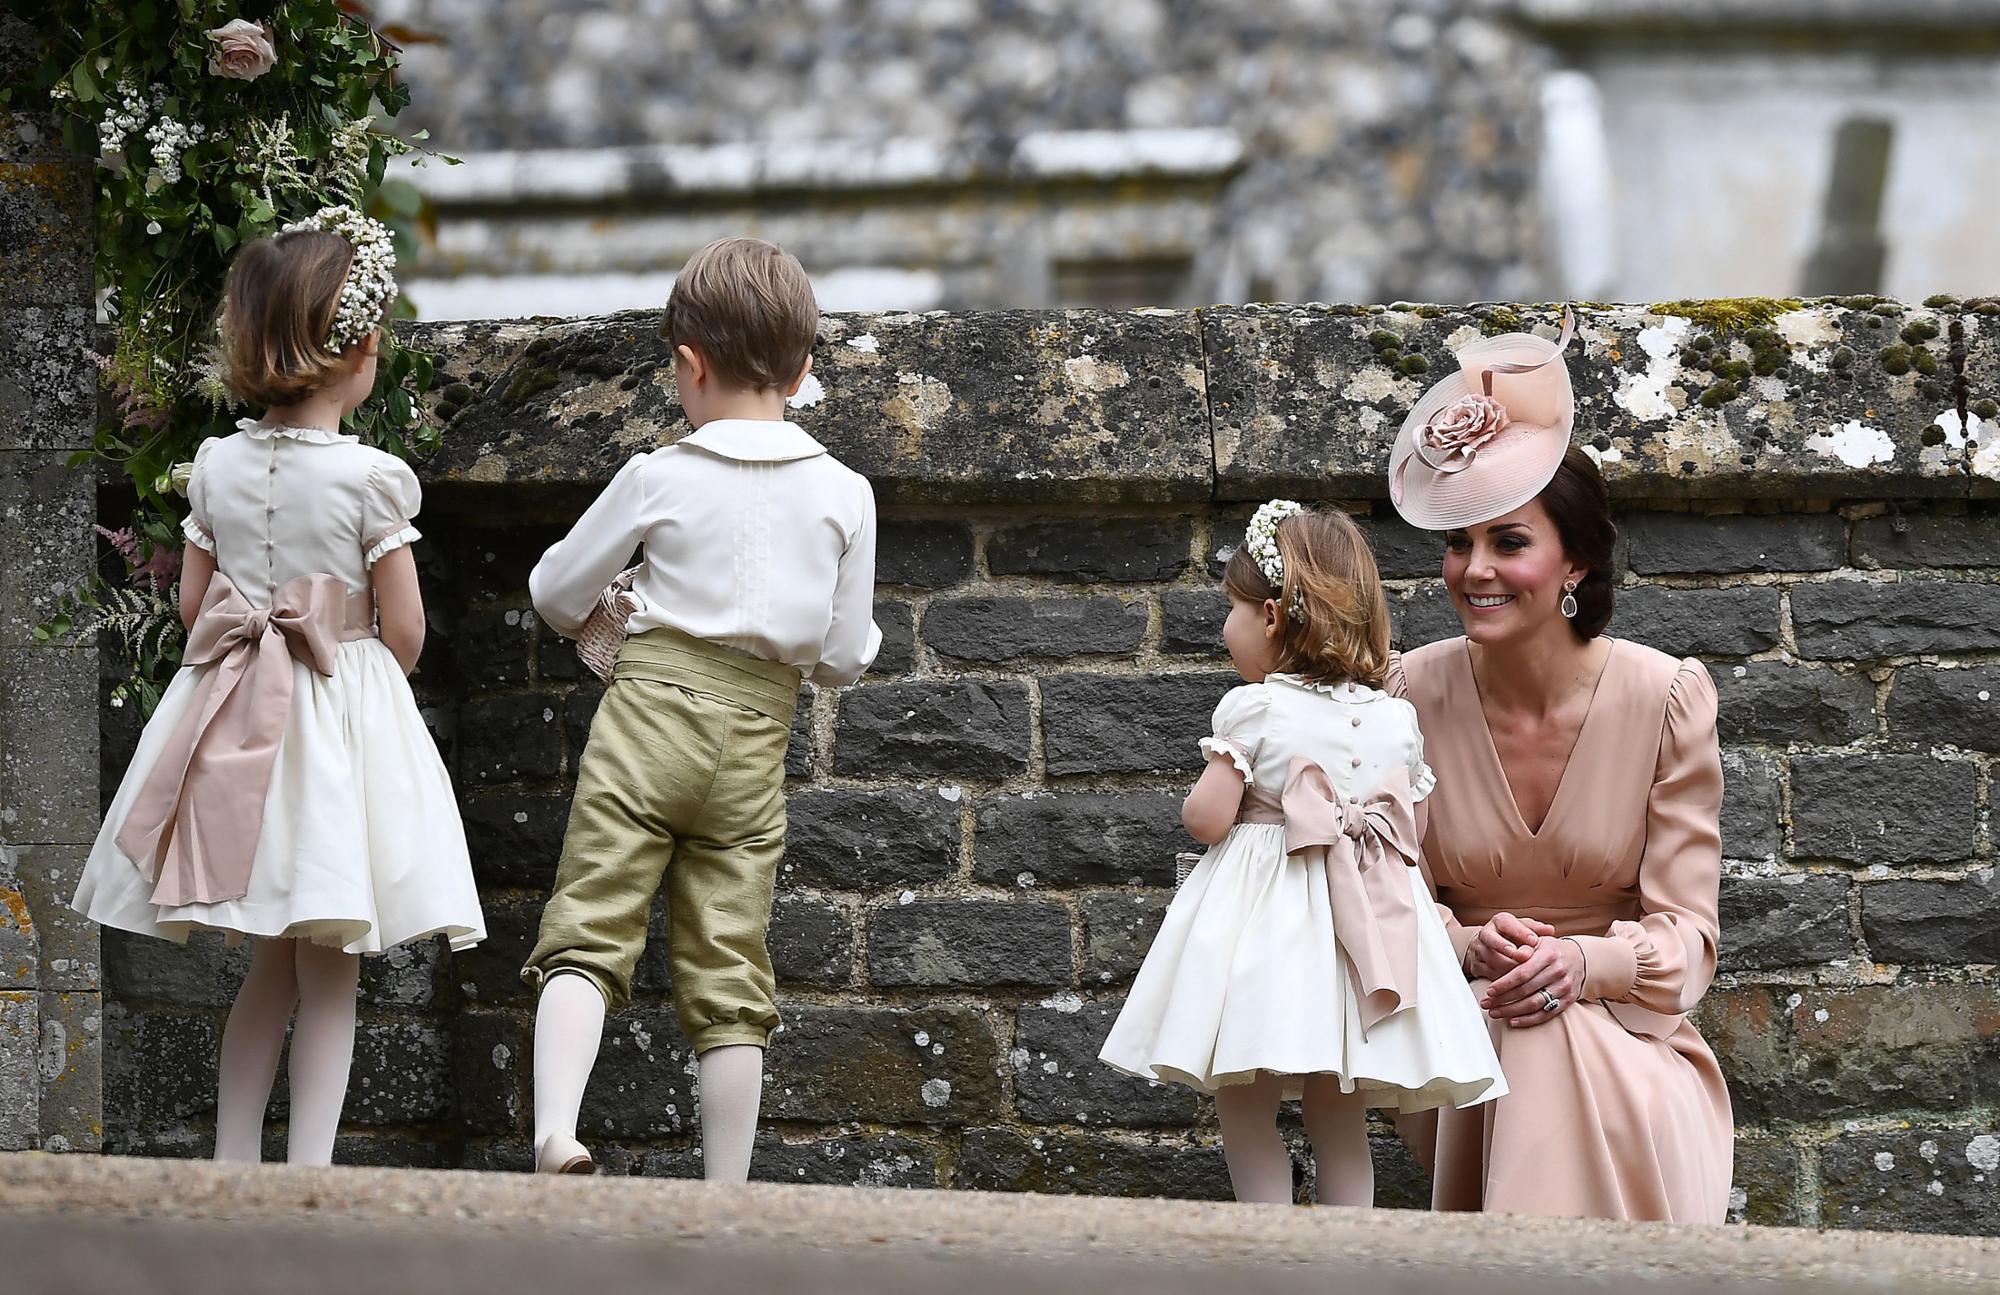 Pippa Middleton Hat Ja Gesagt | Stars